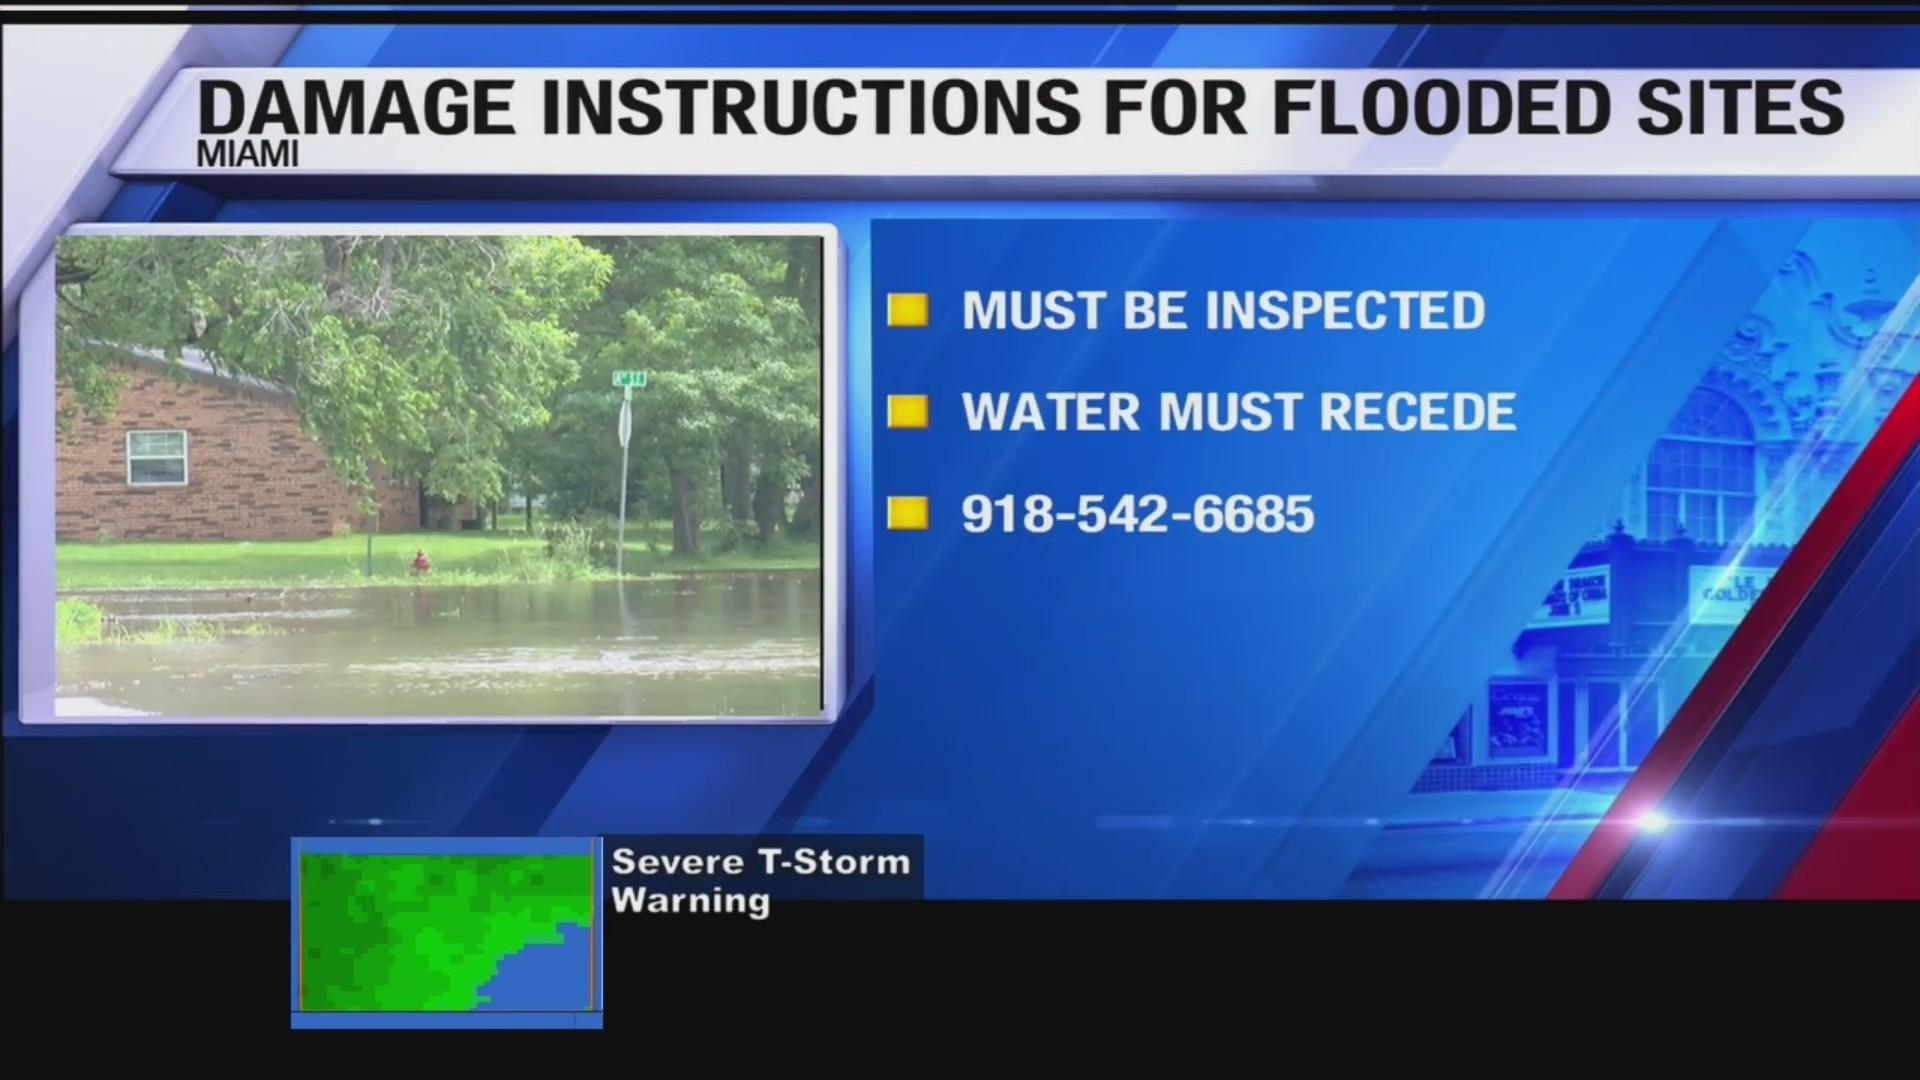 Miami Flood Guidelines